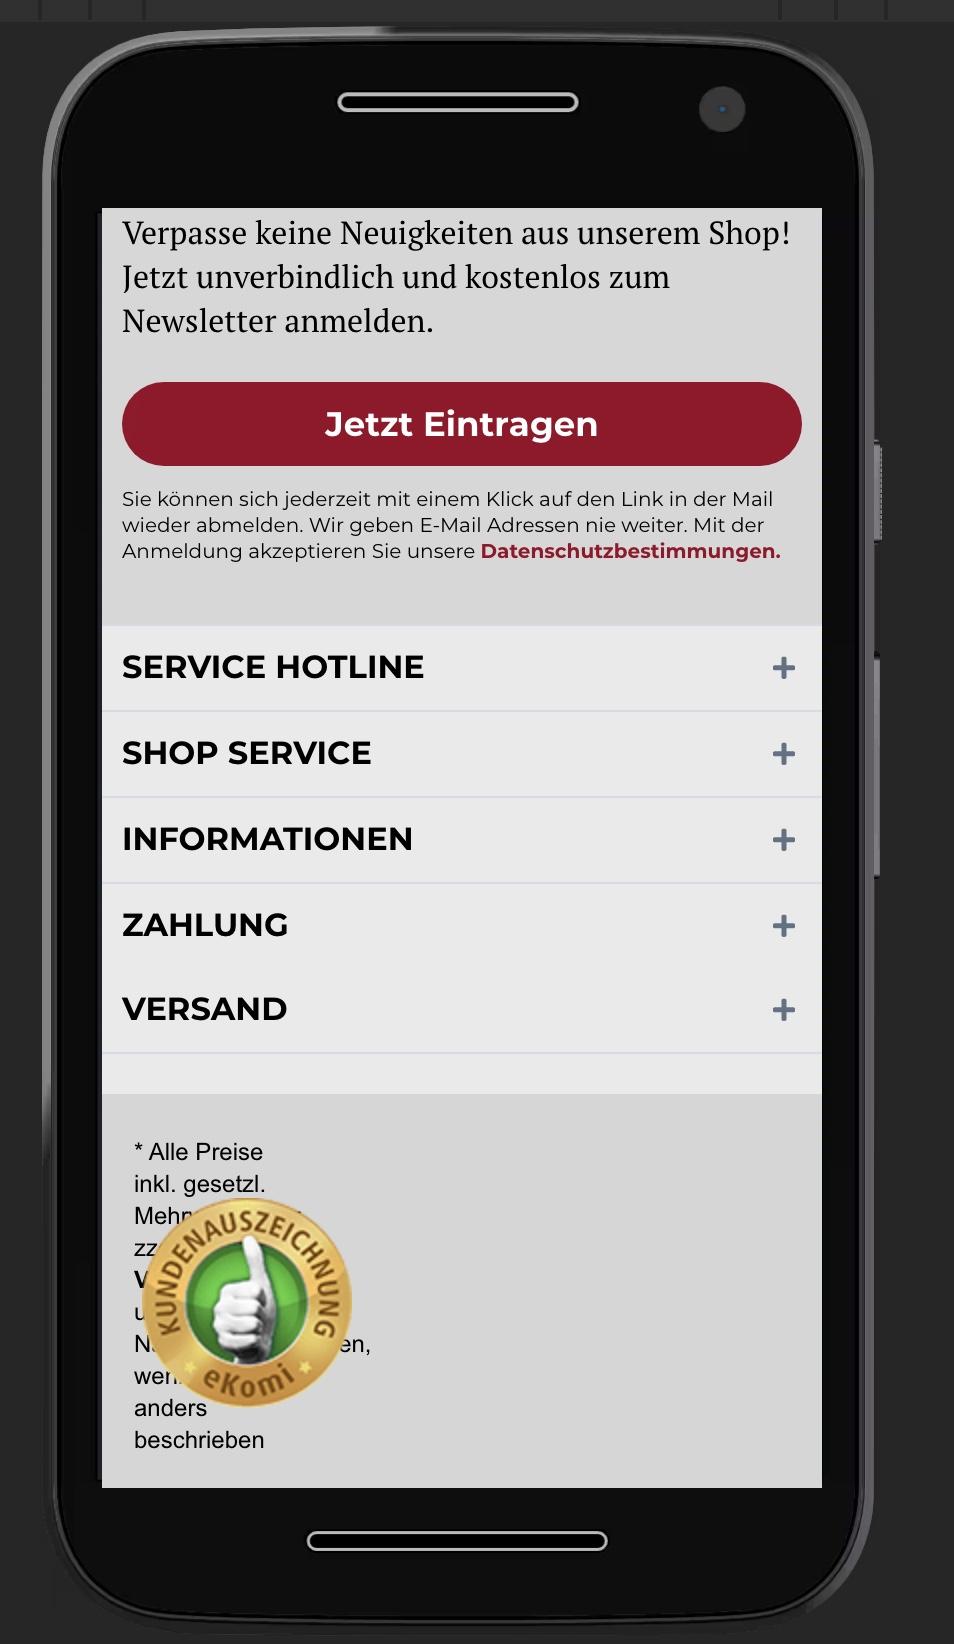 eKomi Badge einbinden - 11 - Widget 2 - Smartphone drin